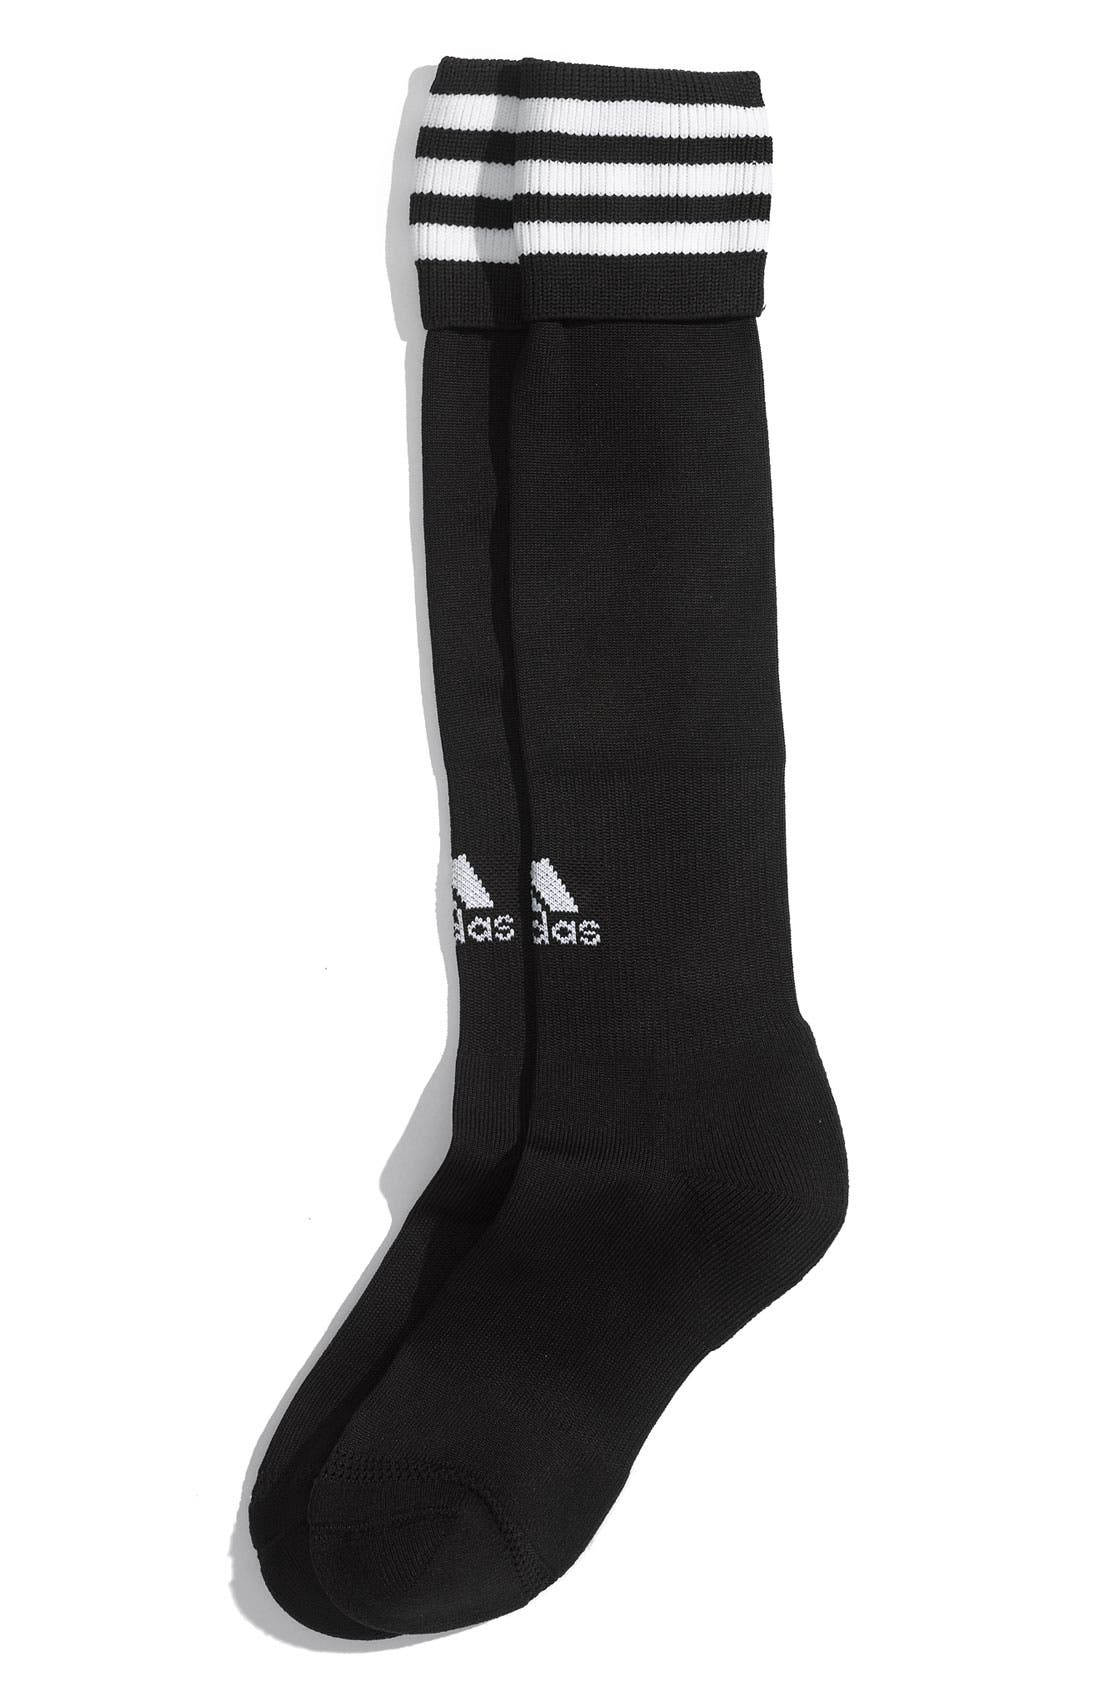 Alternate Image 2  - adidas 'Copa Zone' Soccer Socks (Little Boys & Big Boys)